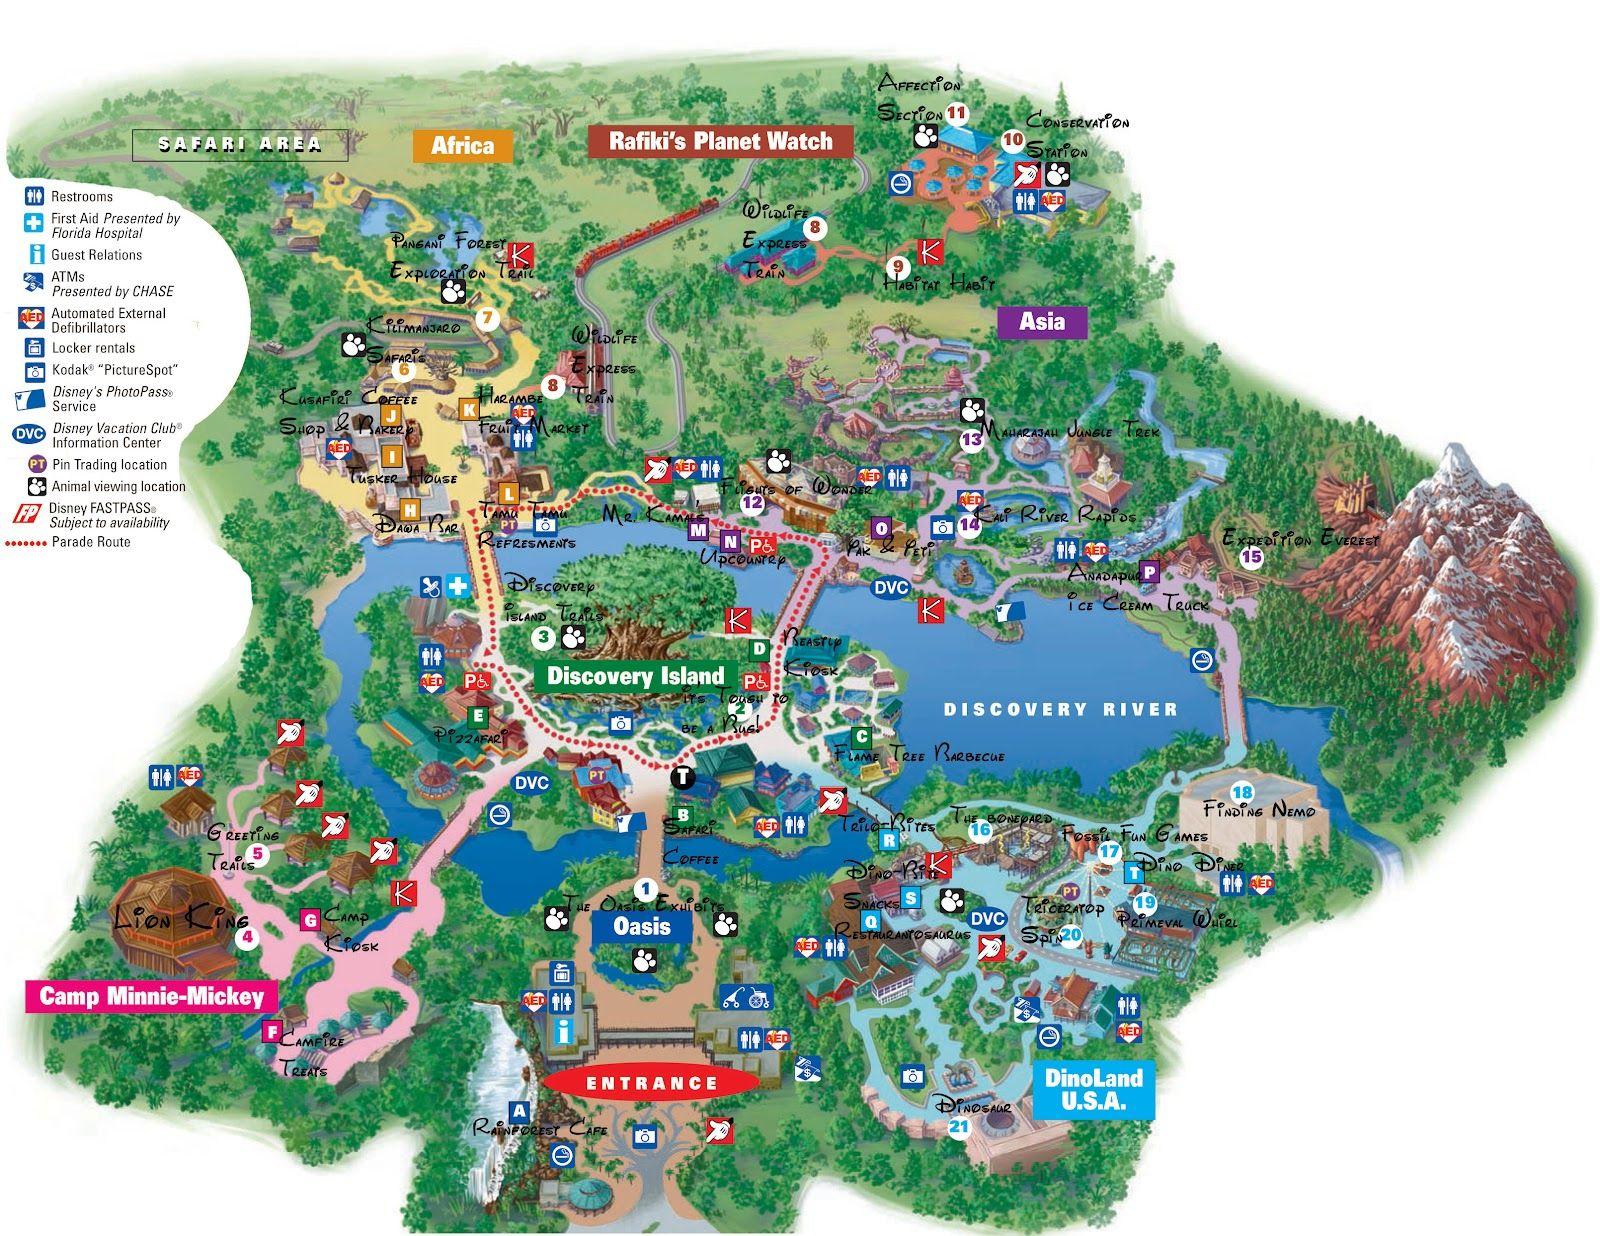 disneyworld map | Disney World Adventure | Travel - Theme ... on